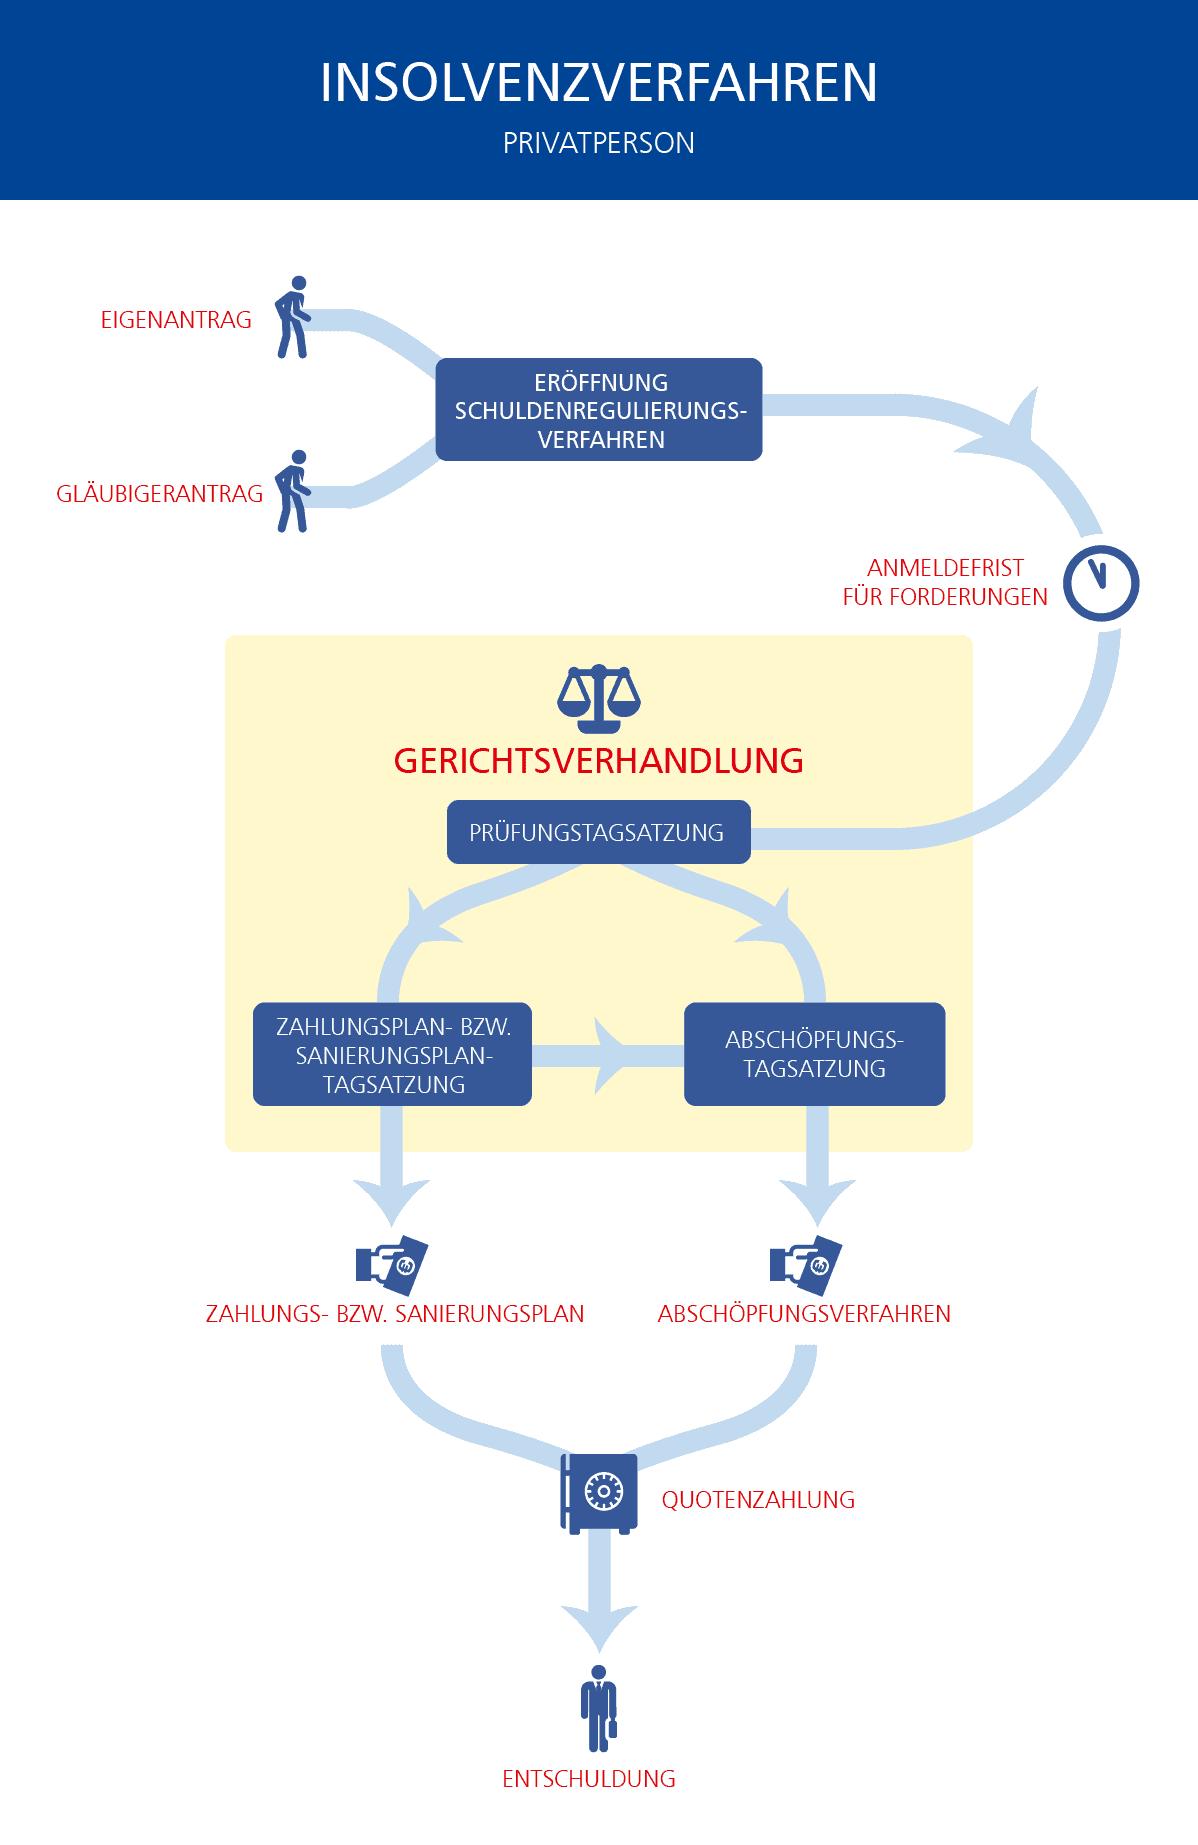 Infografik_AKV_Insolvenz_Privat_ohne_Logo